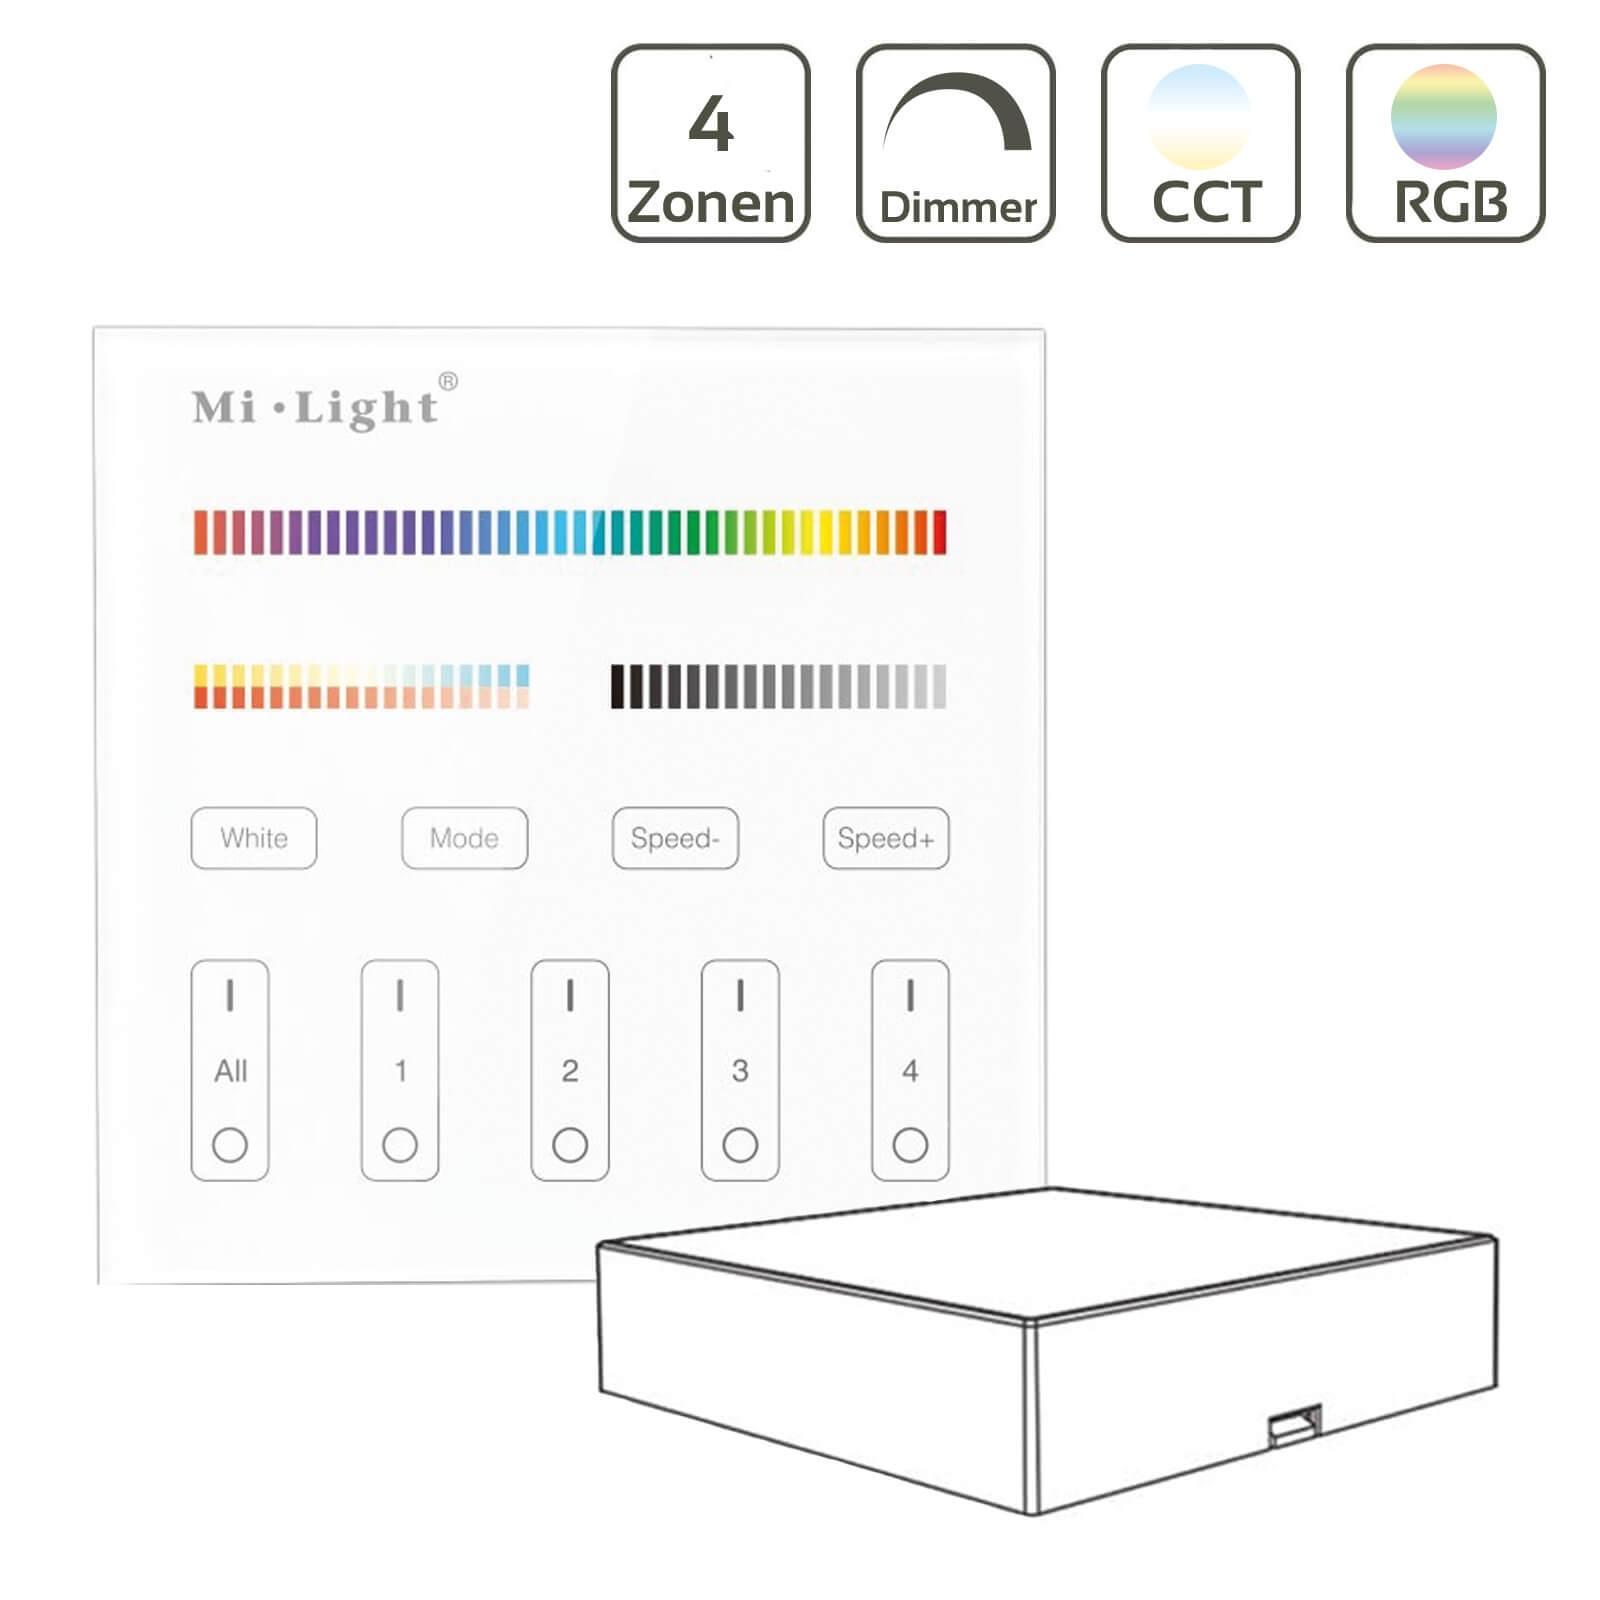 MiBoxer RGB+CCT Wandschalter 4 Zonen Aufbau Dimmen Schalten Farbsteuerung batteriebetrieben B4